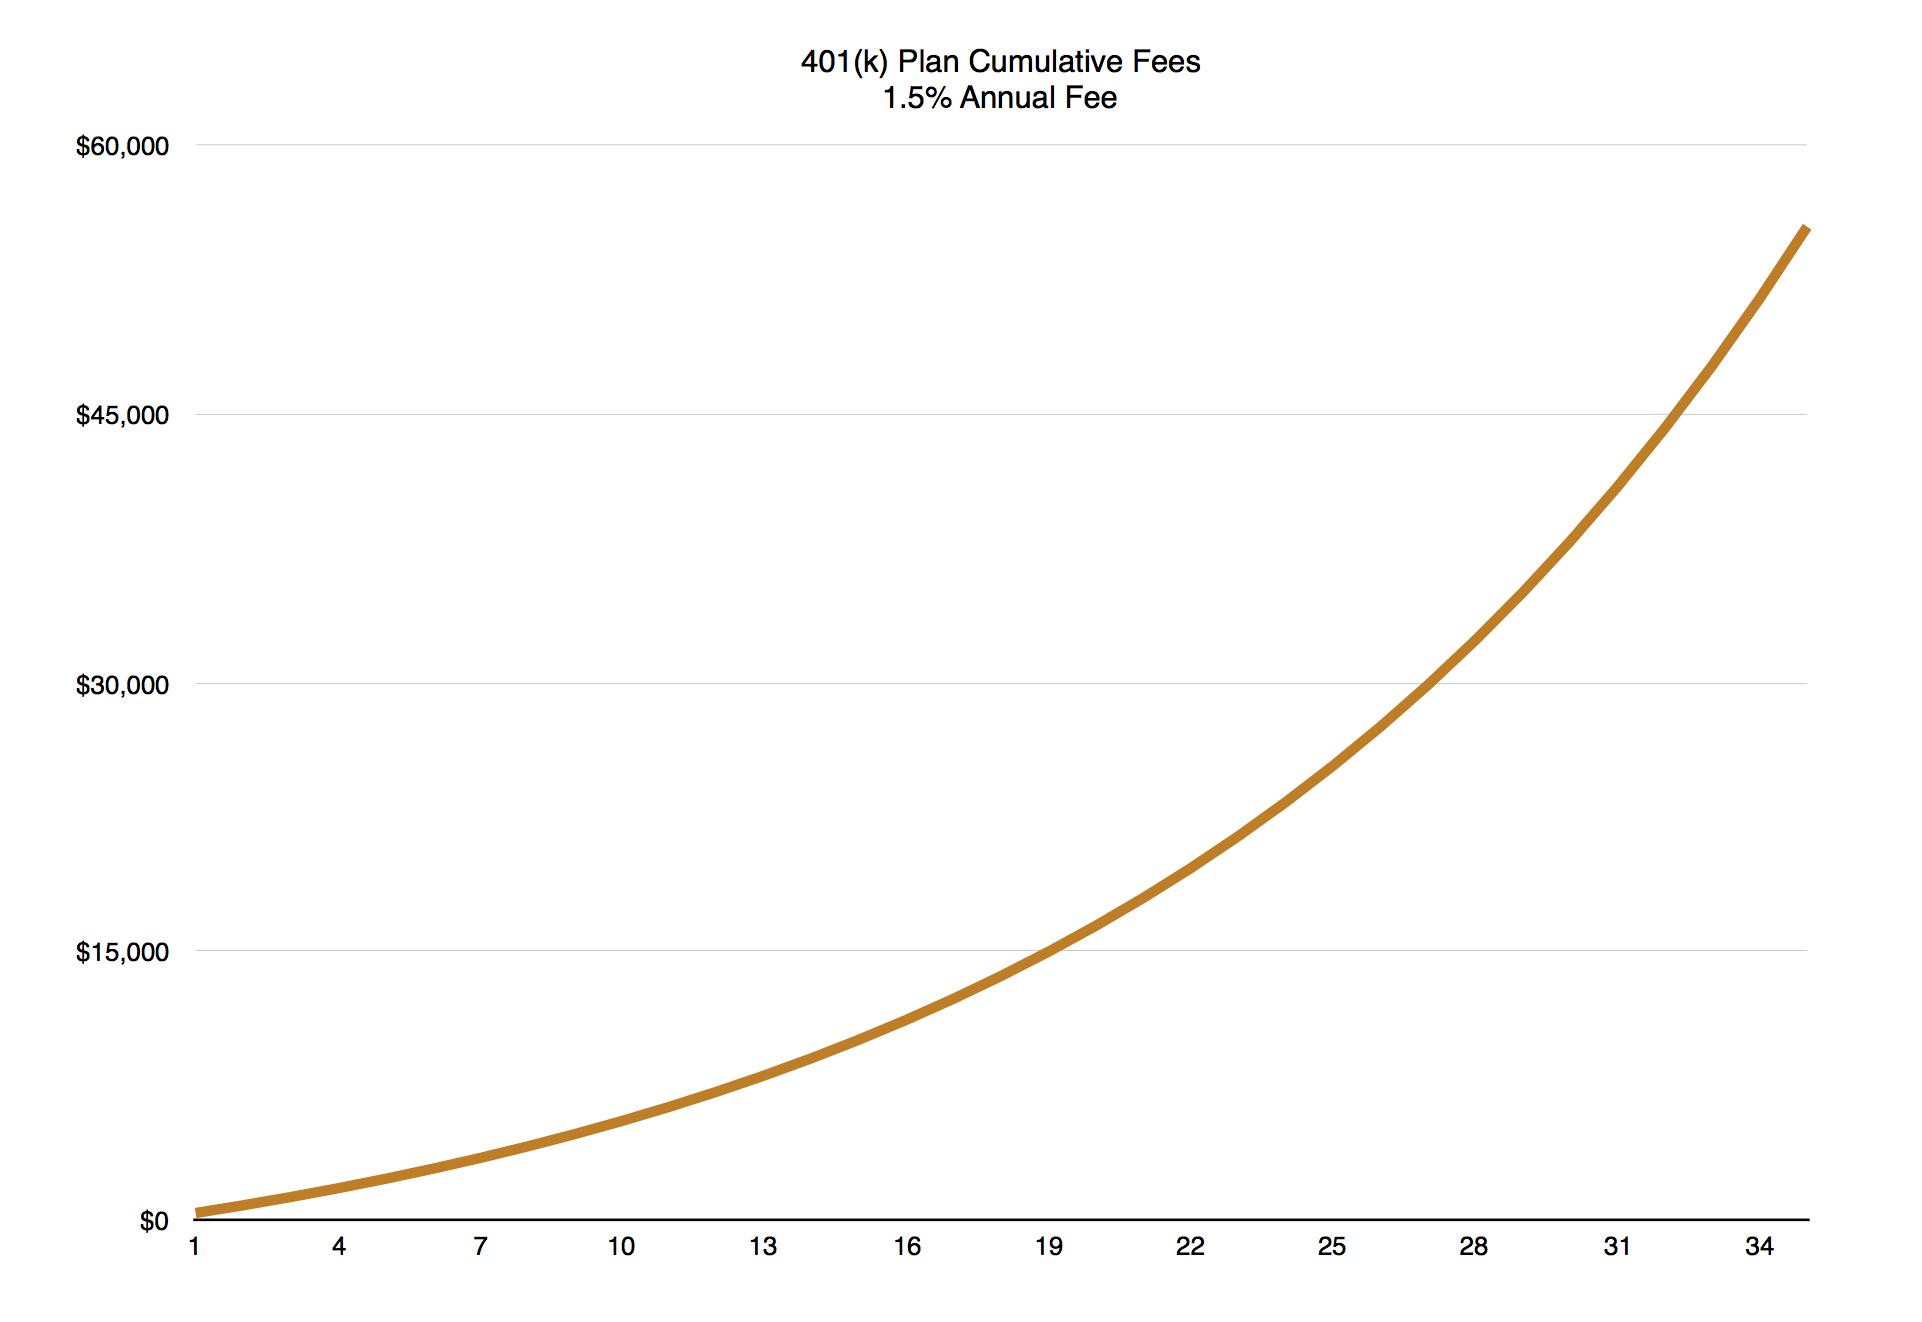 401k_cummulative_fees.png